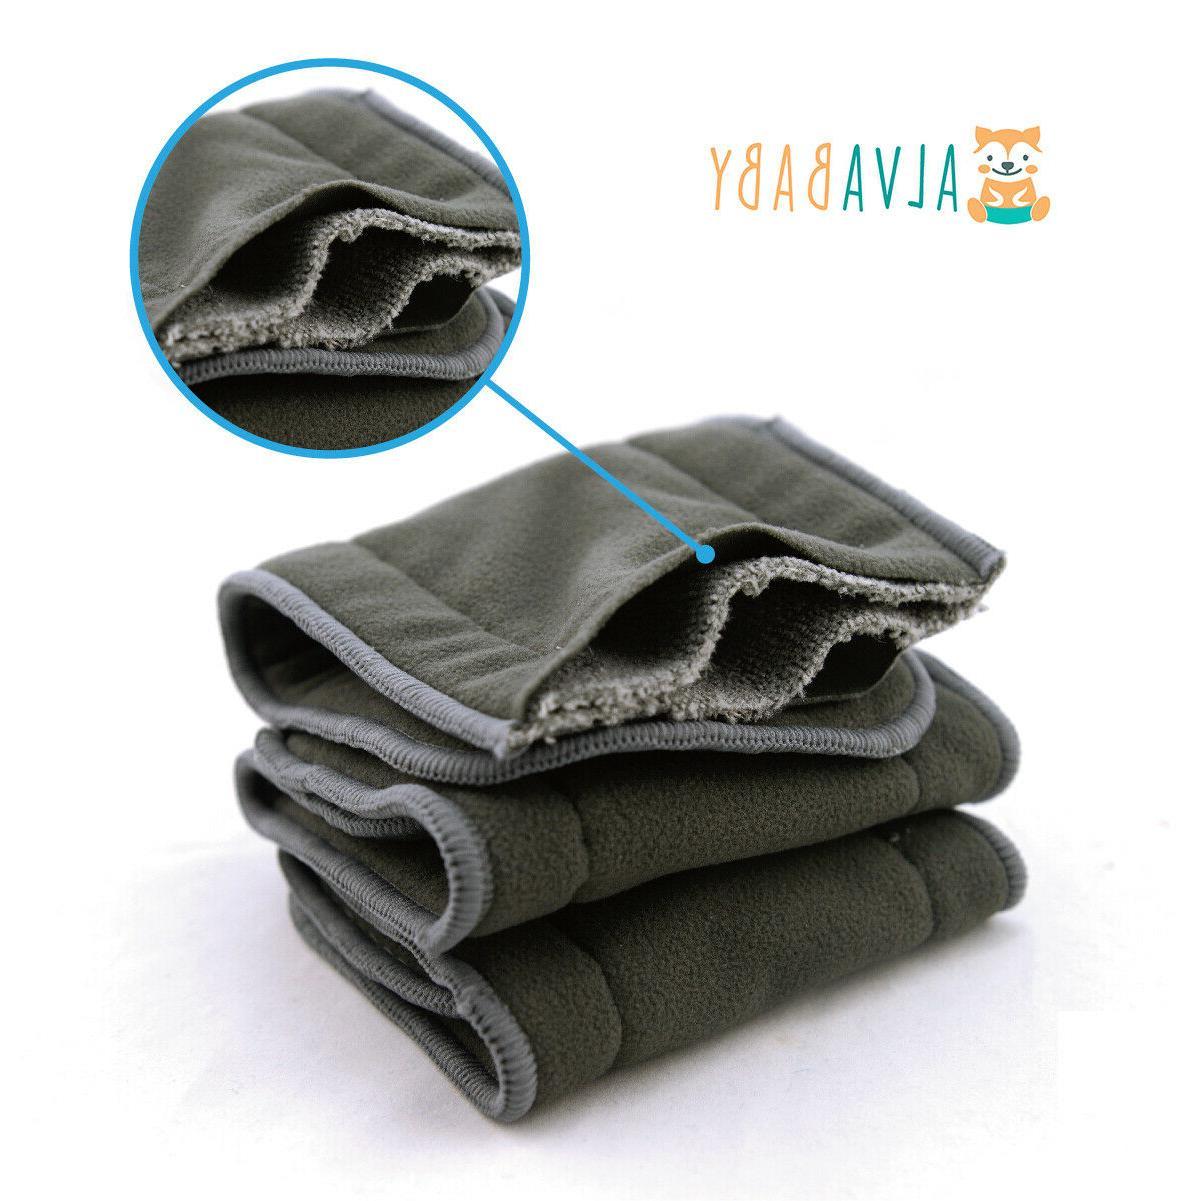 6pcs reusable 4 layers charcoal bamboo inserts